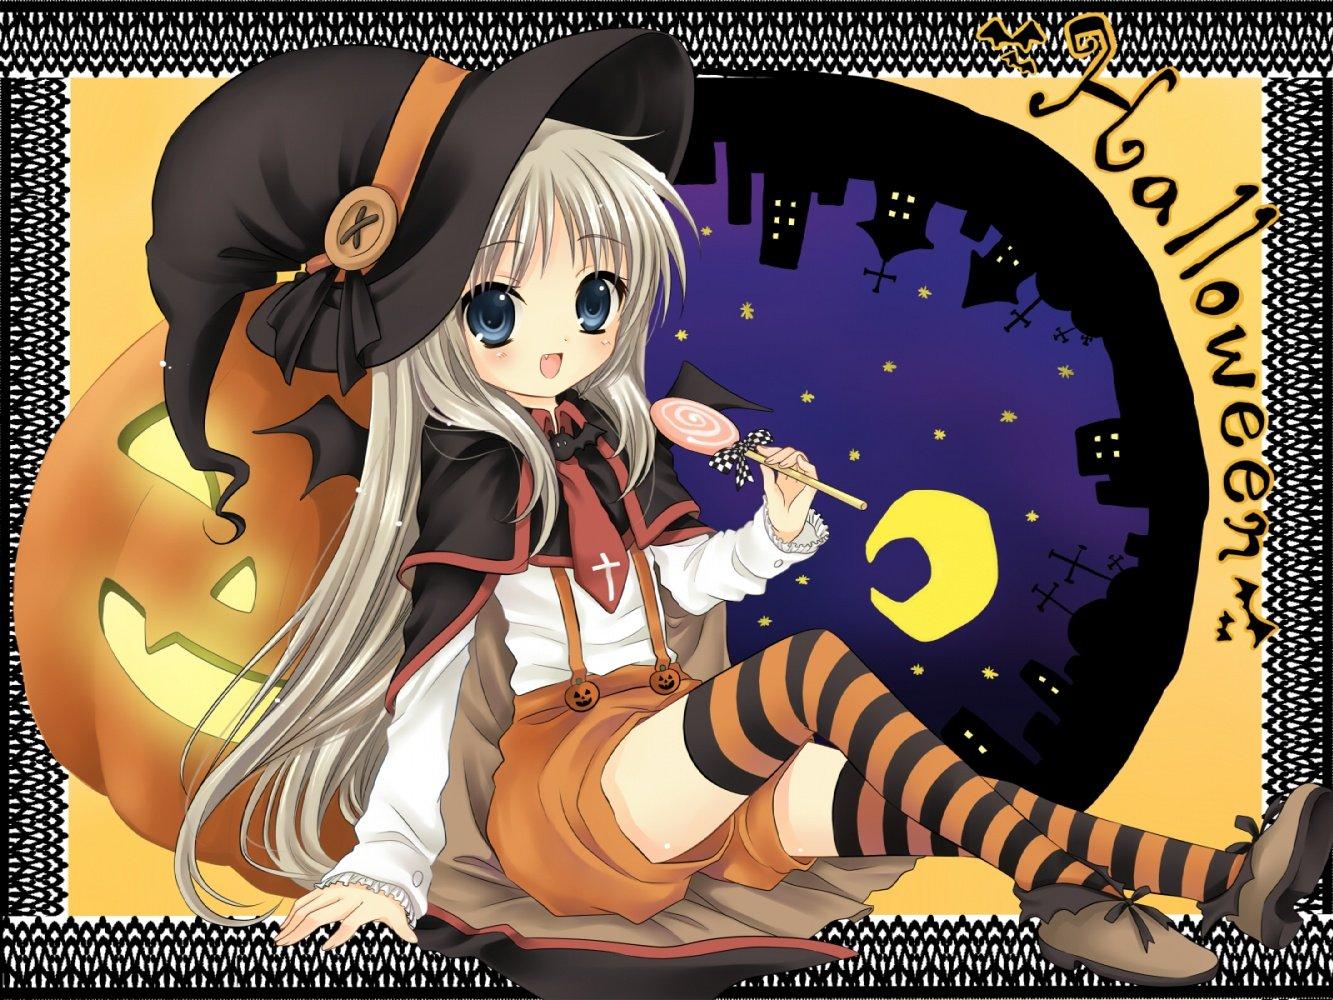 http://2.bp.blogspot.com/_SNcJFOCi7wI/TLH95e1pRUI/AAAAAAAAALw/2Z5m8rmqDh0/s1600/93_Anime_Anime_Girls_Anime_Wallpaper.jpg